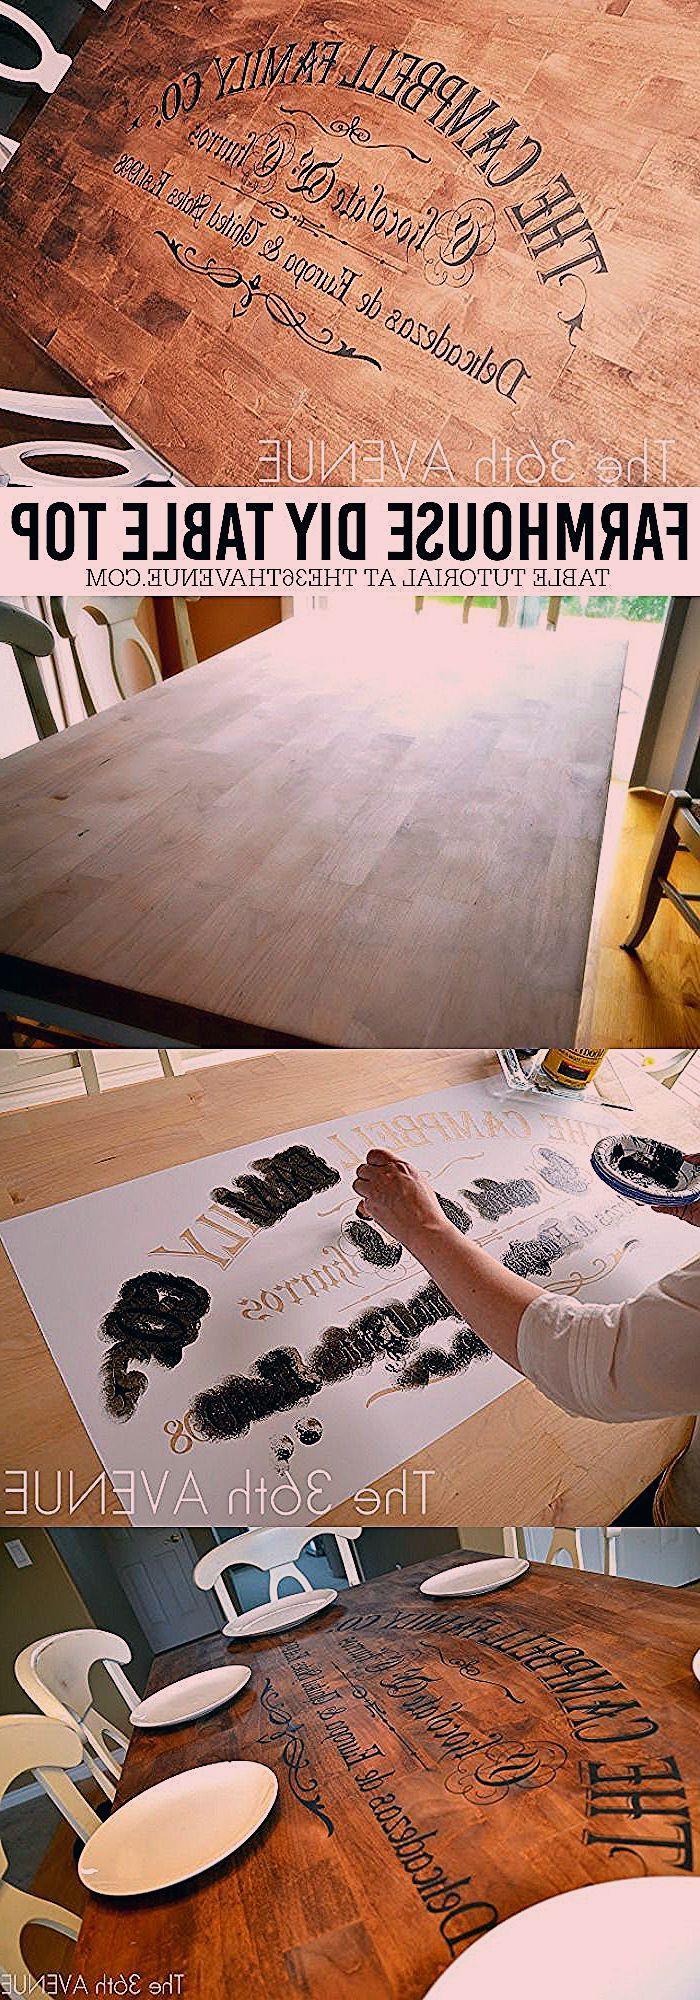 DIY Furniture - Farmhouse Table Makeover